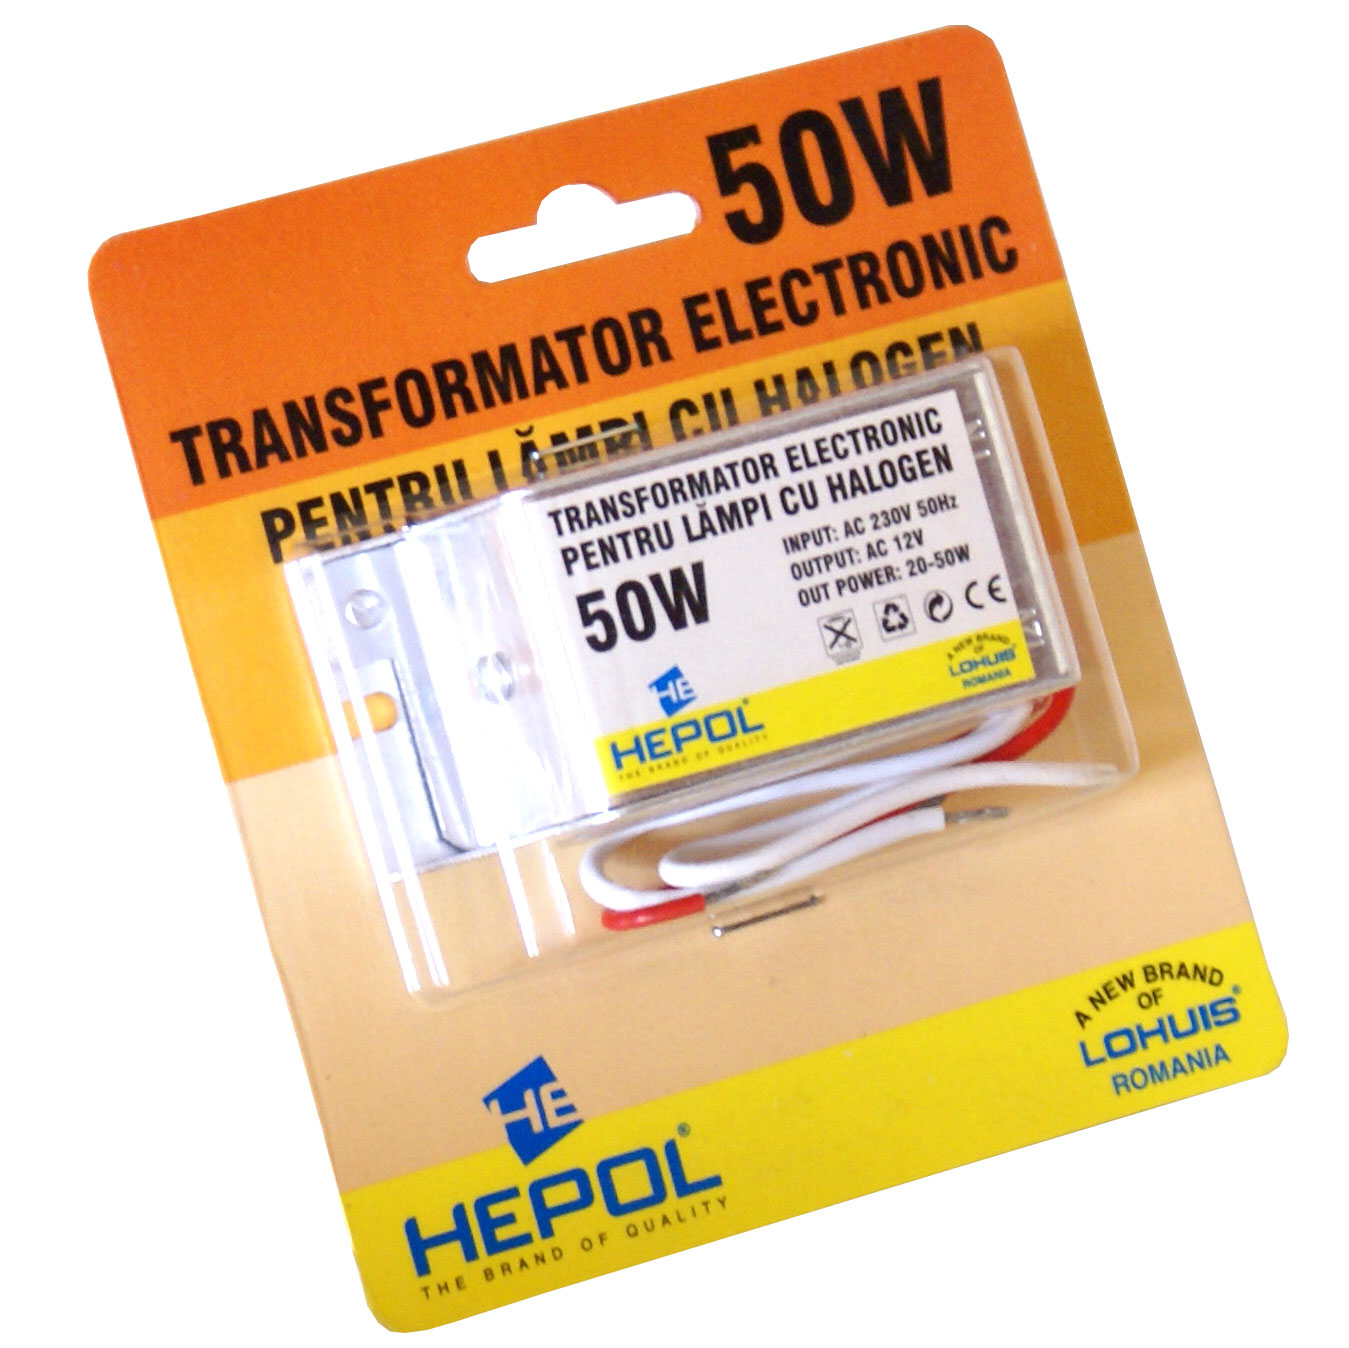 Transformator electronic HEPOL, pentru lampi cu halogen, 12V, 50W